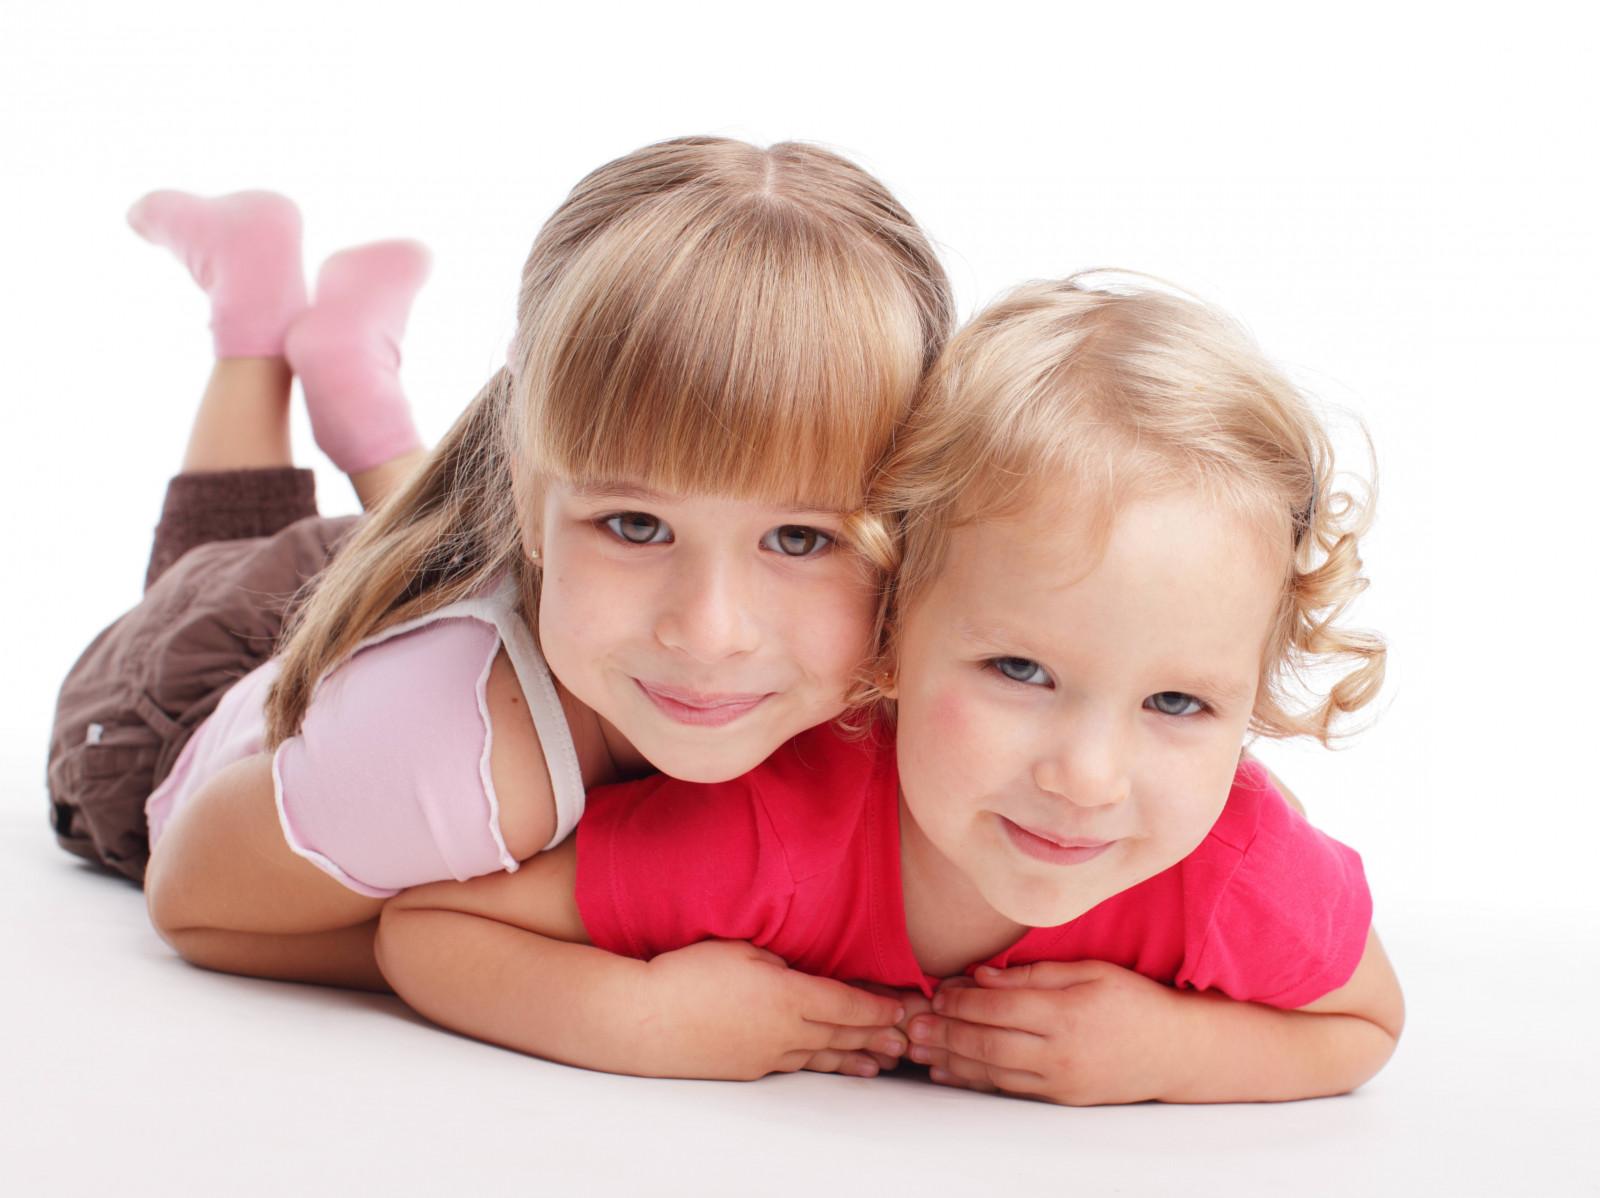 Картинки с сестренками